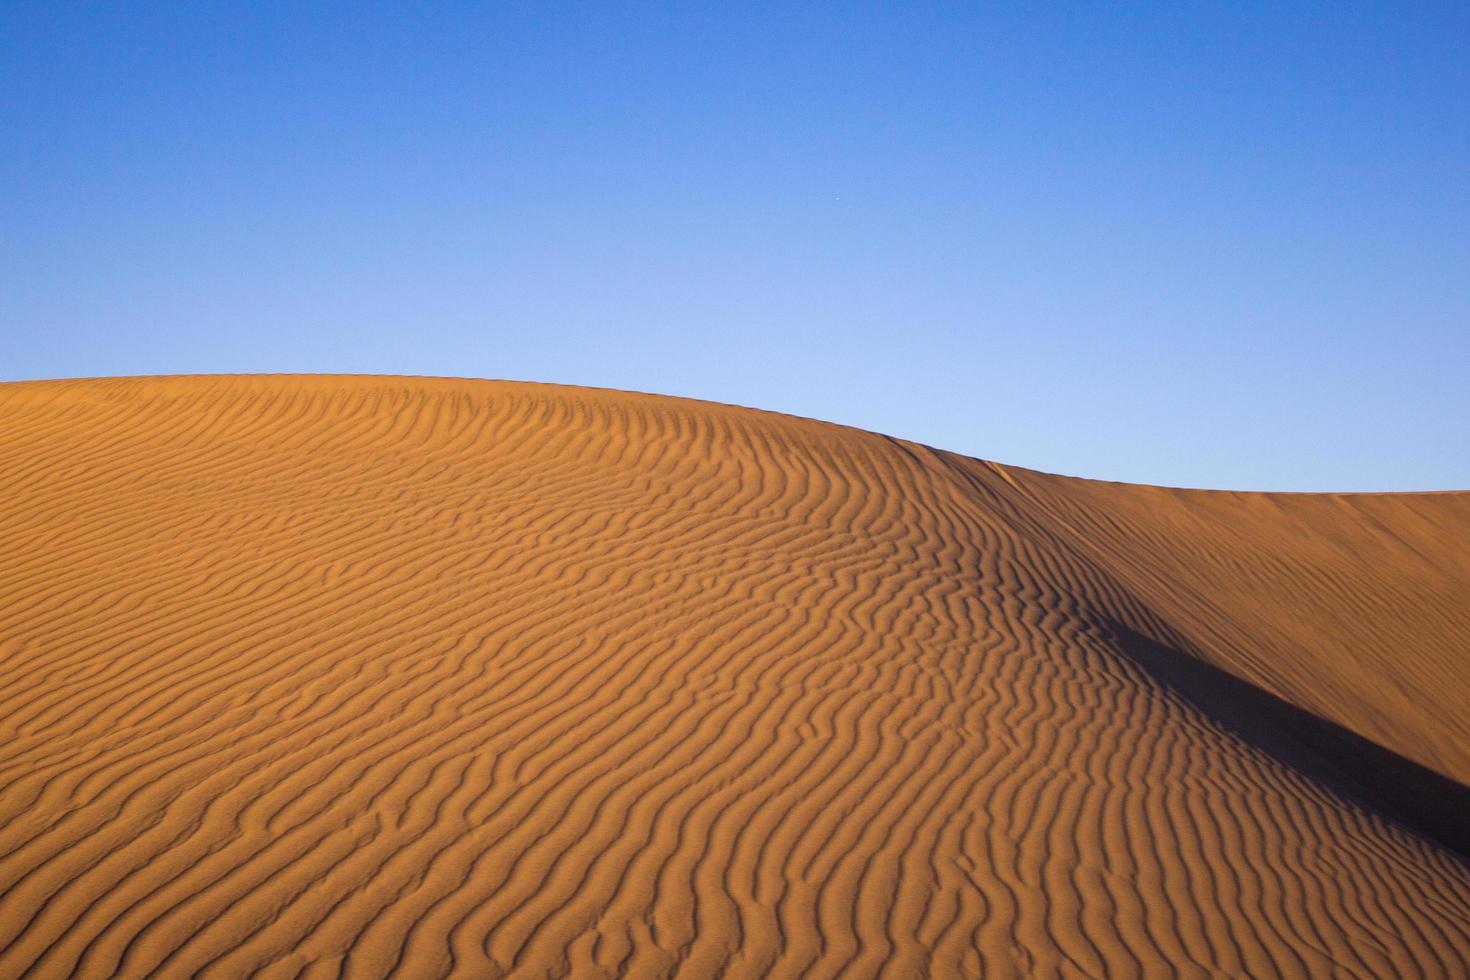 Sand dunes in full sun photo